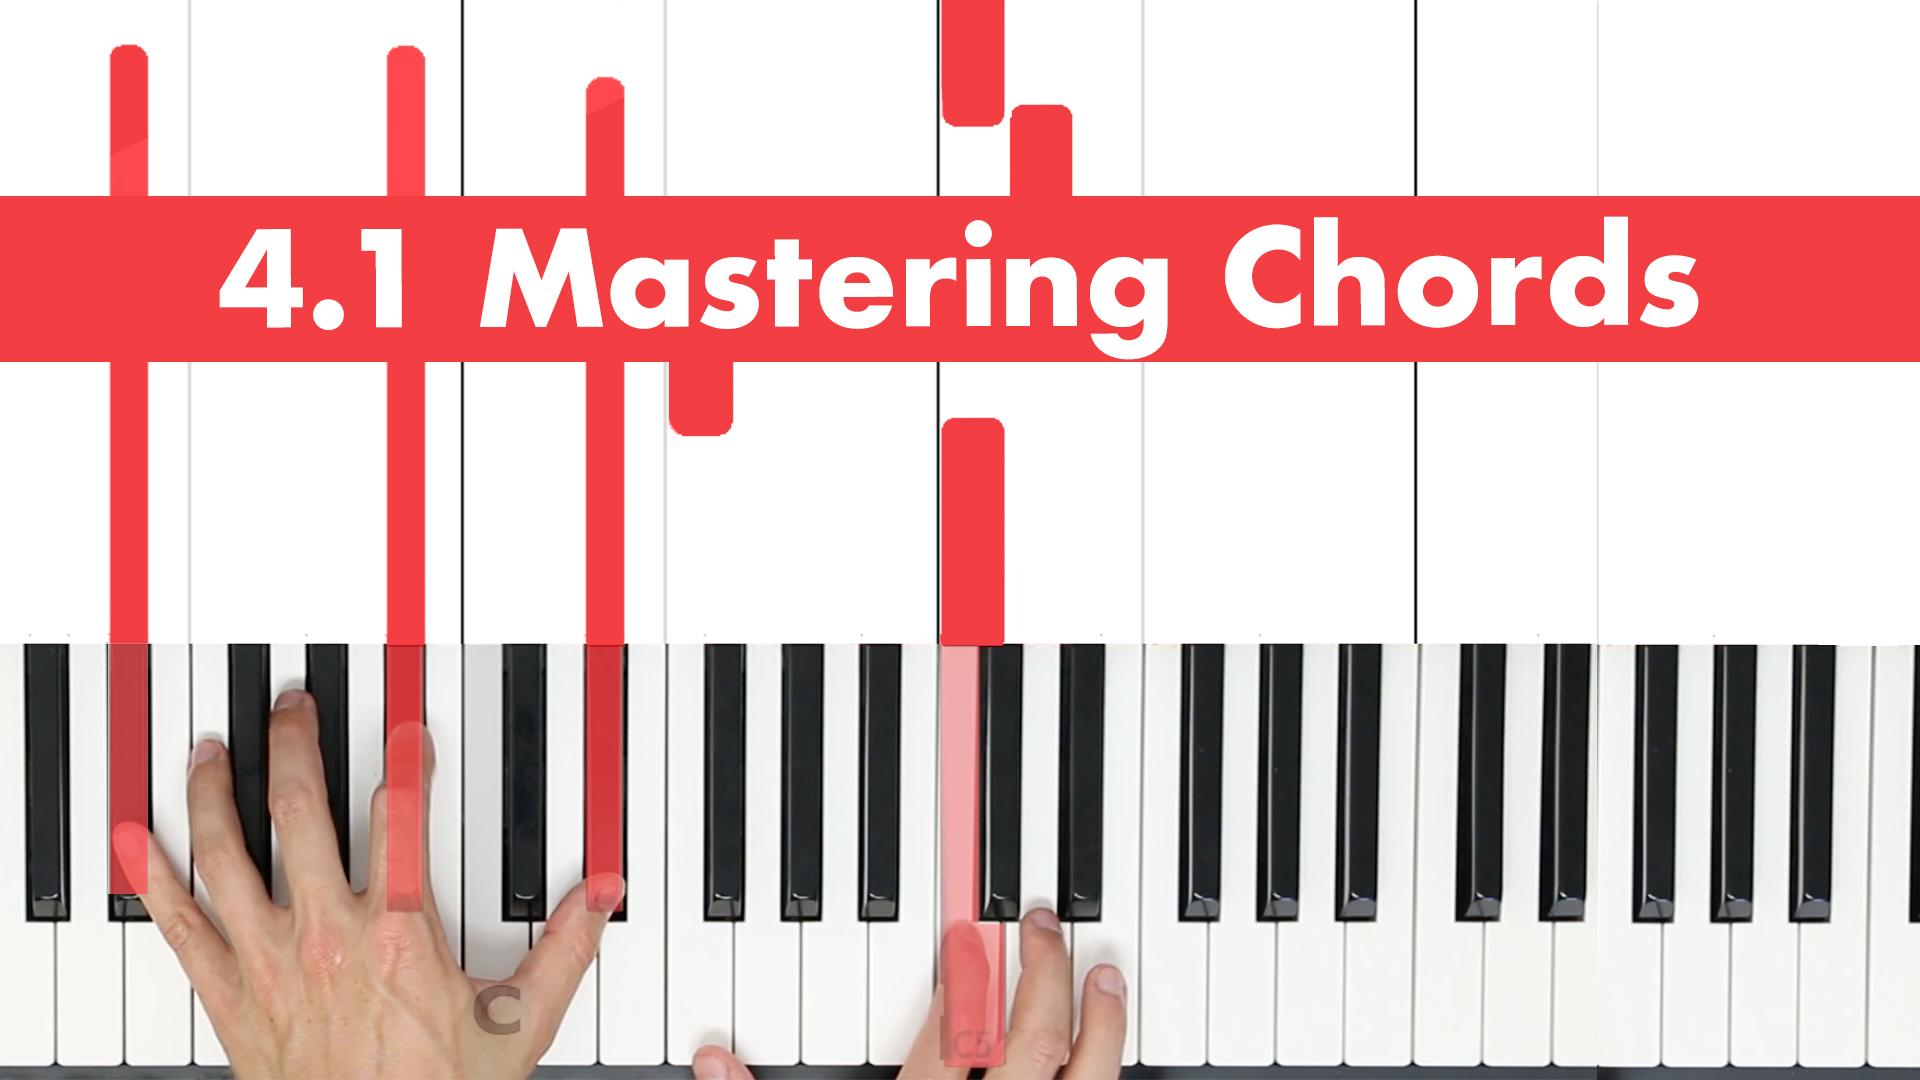 4.1 Mastering Chords